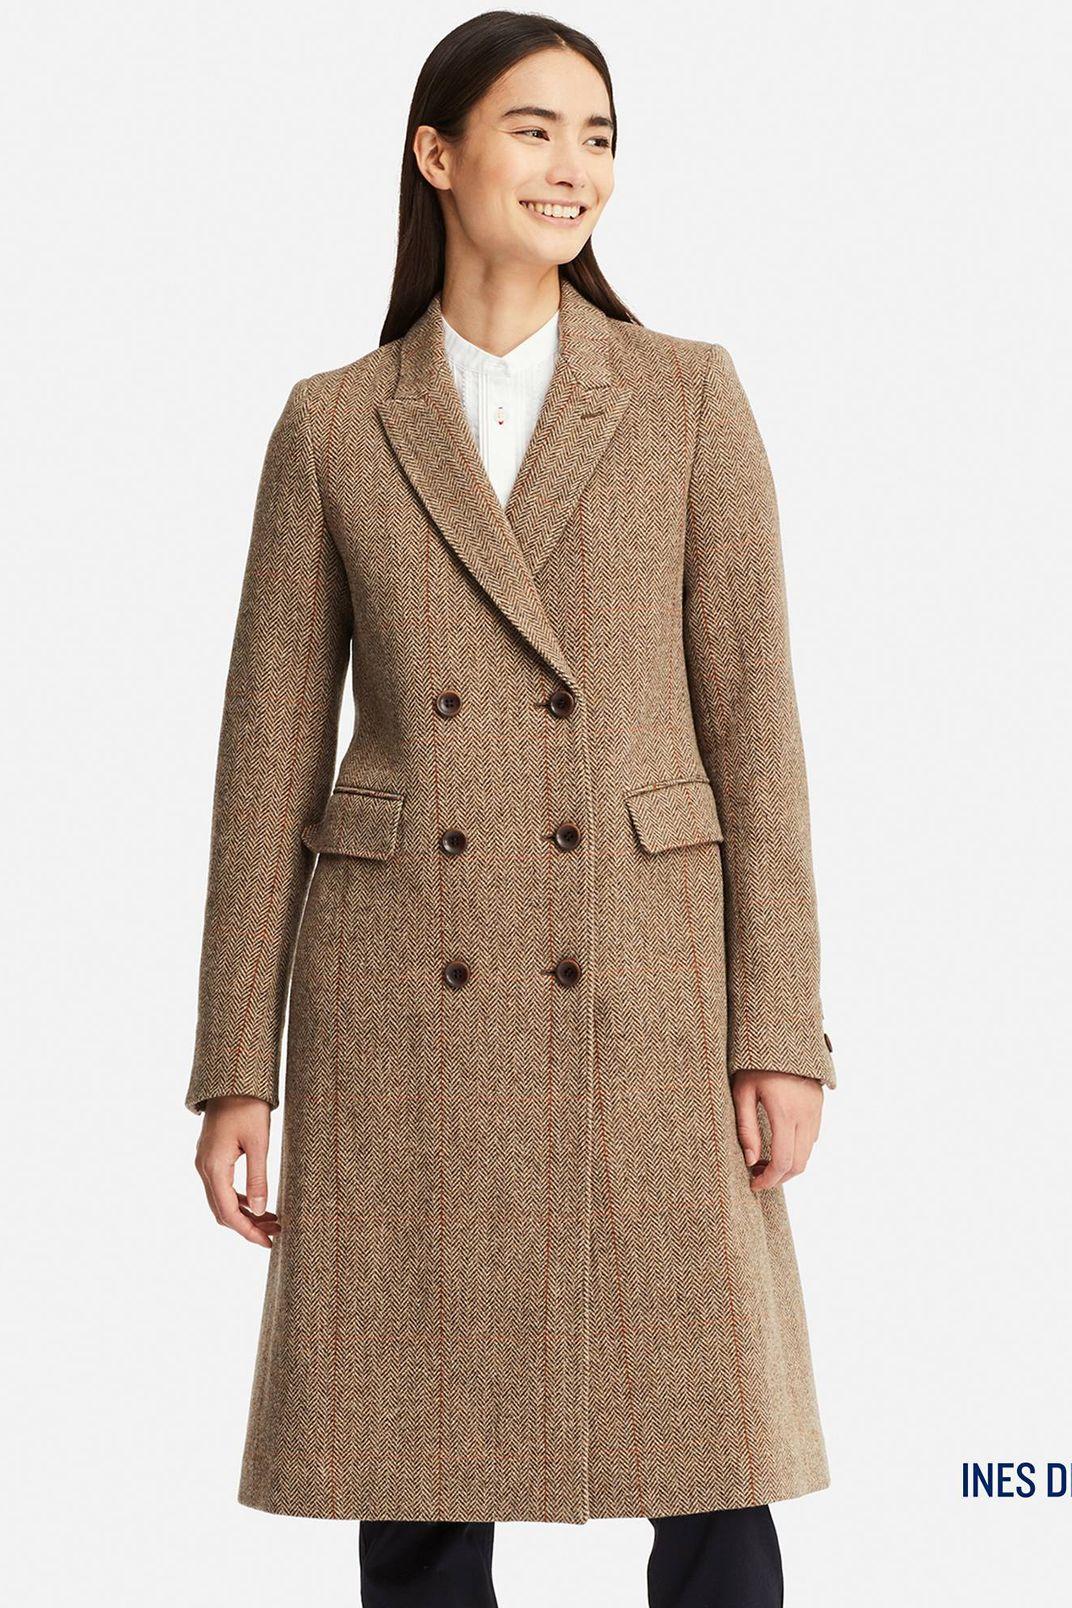 Uniqlo Women's Tweed Coat (Inès de la Fressange)